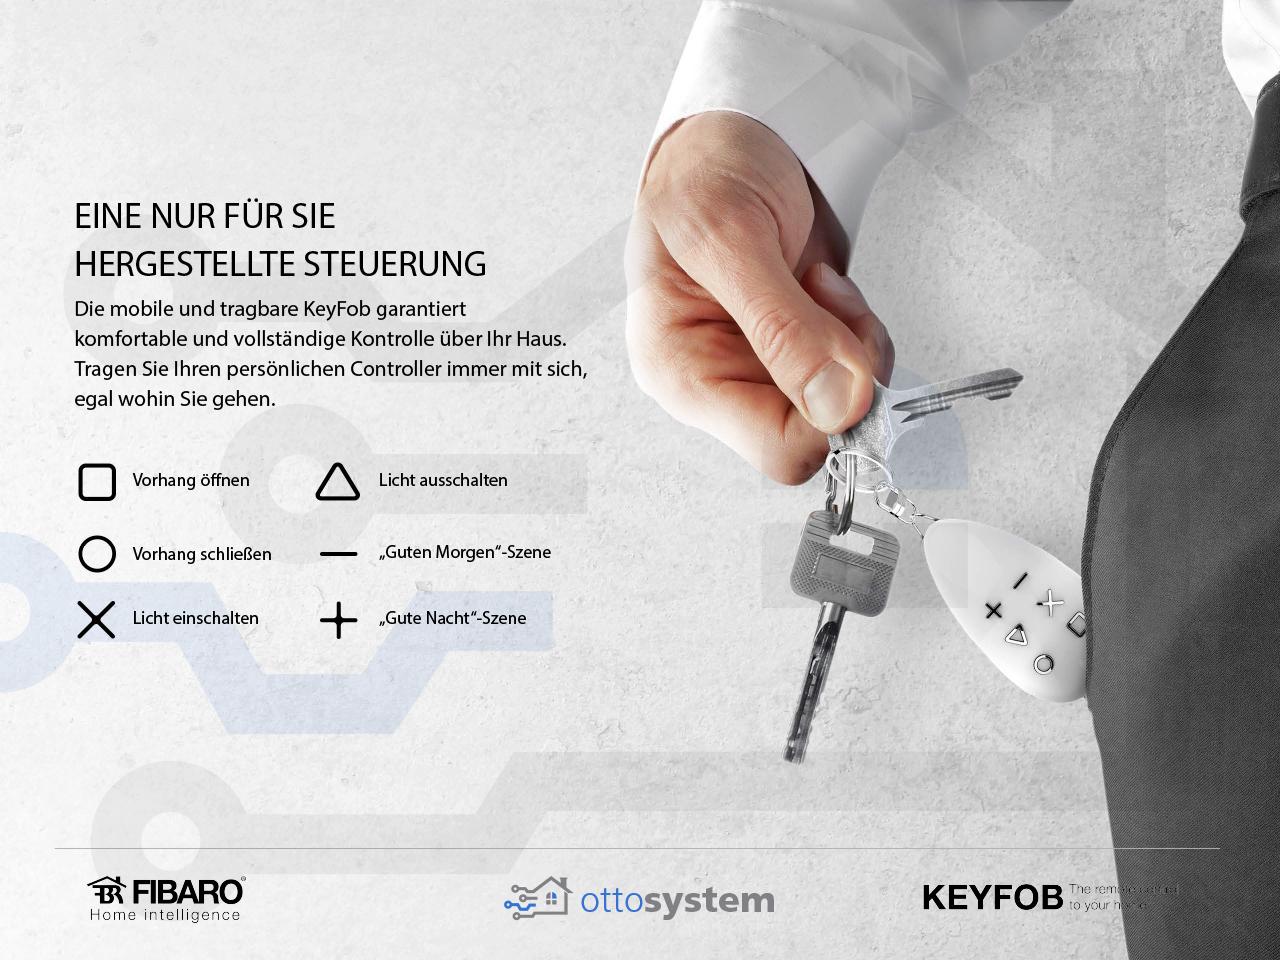 Pr-sentation_FIBARO_KeyFob_ottosystem-12